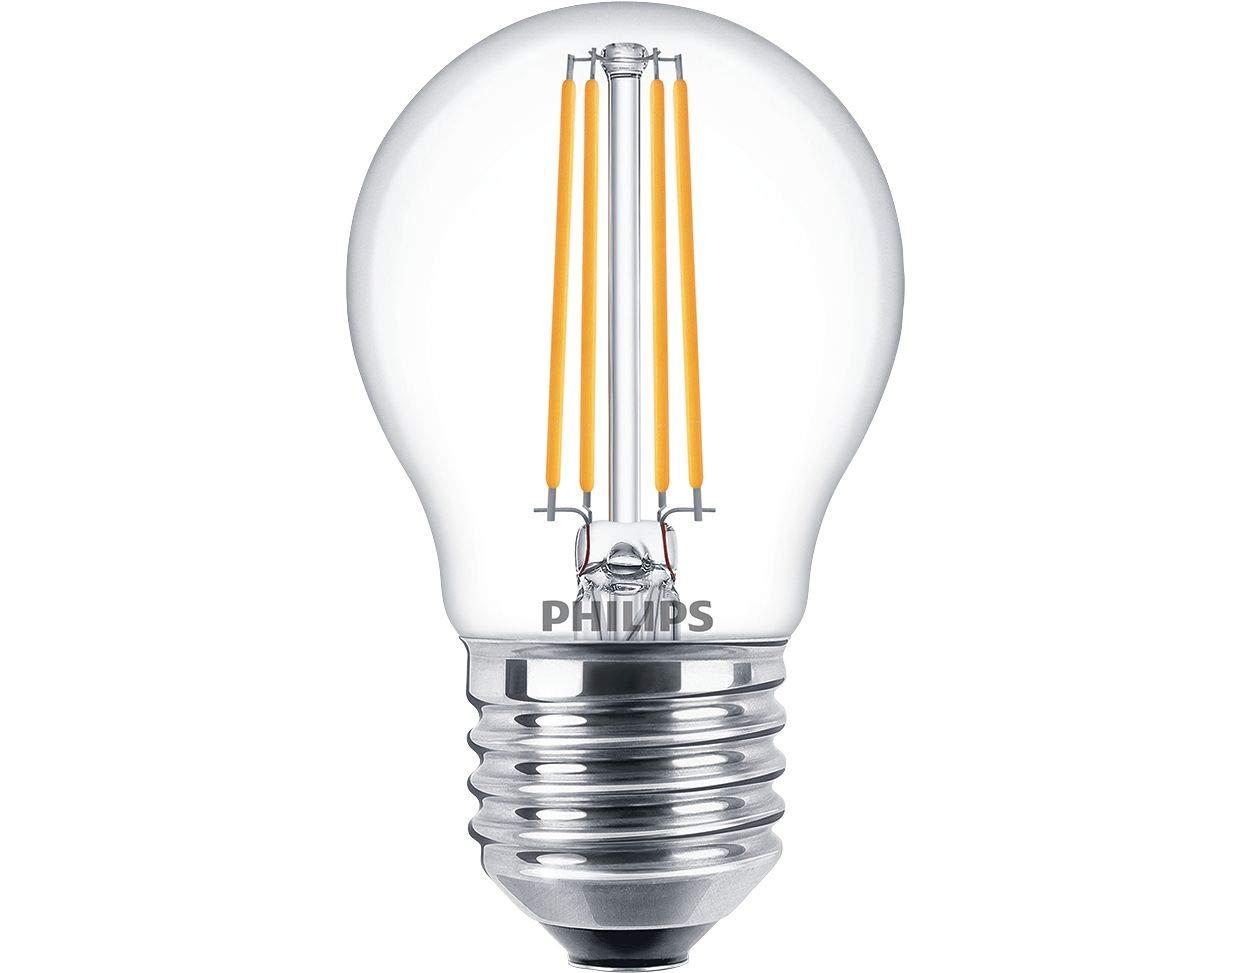 Beleuchtungsbauteile Philips Classic LEDLuster D 5 40W P45 E27 827 CL LED Lampe  Filament 8718696709924 Leuchtmittel